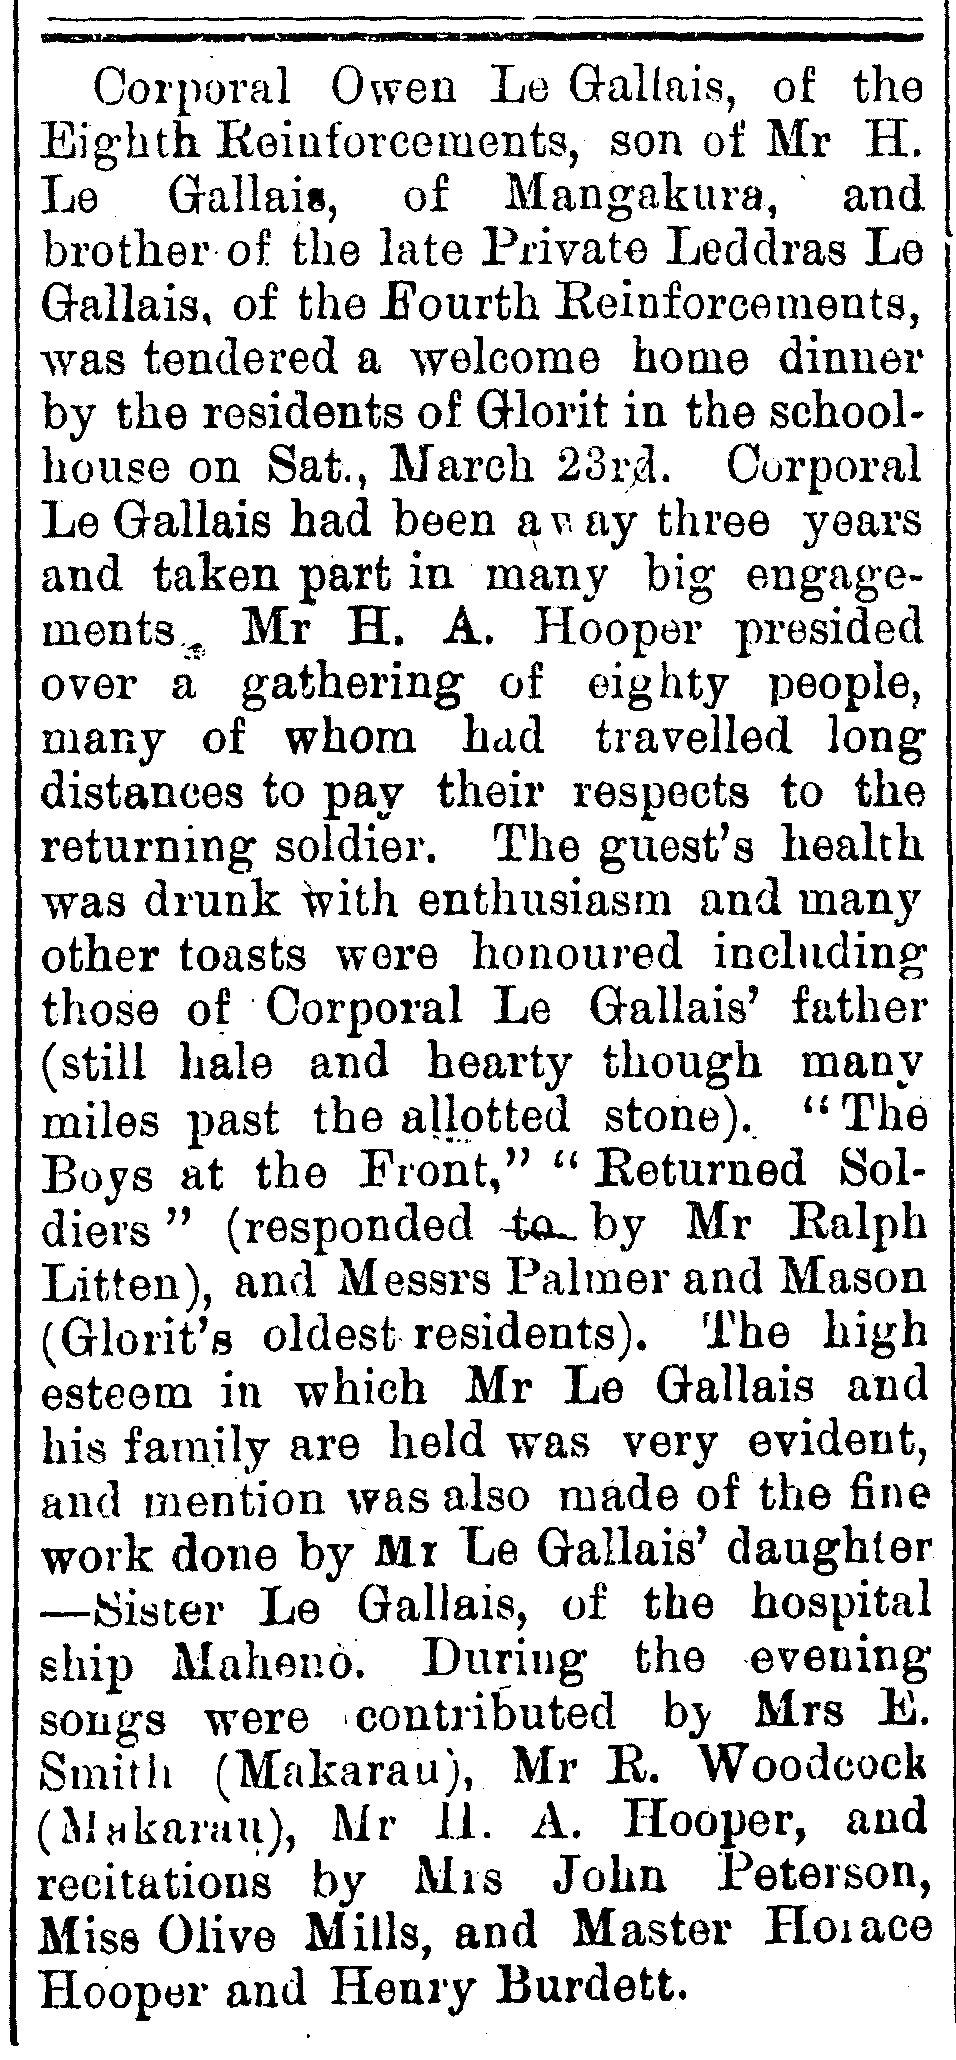 Rodney and Otamatea Times, Waitemata and Kaipara Gazette, 3 April 1918, p. 2